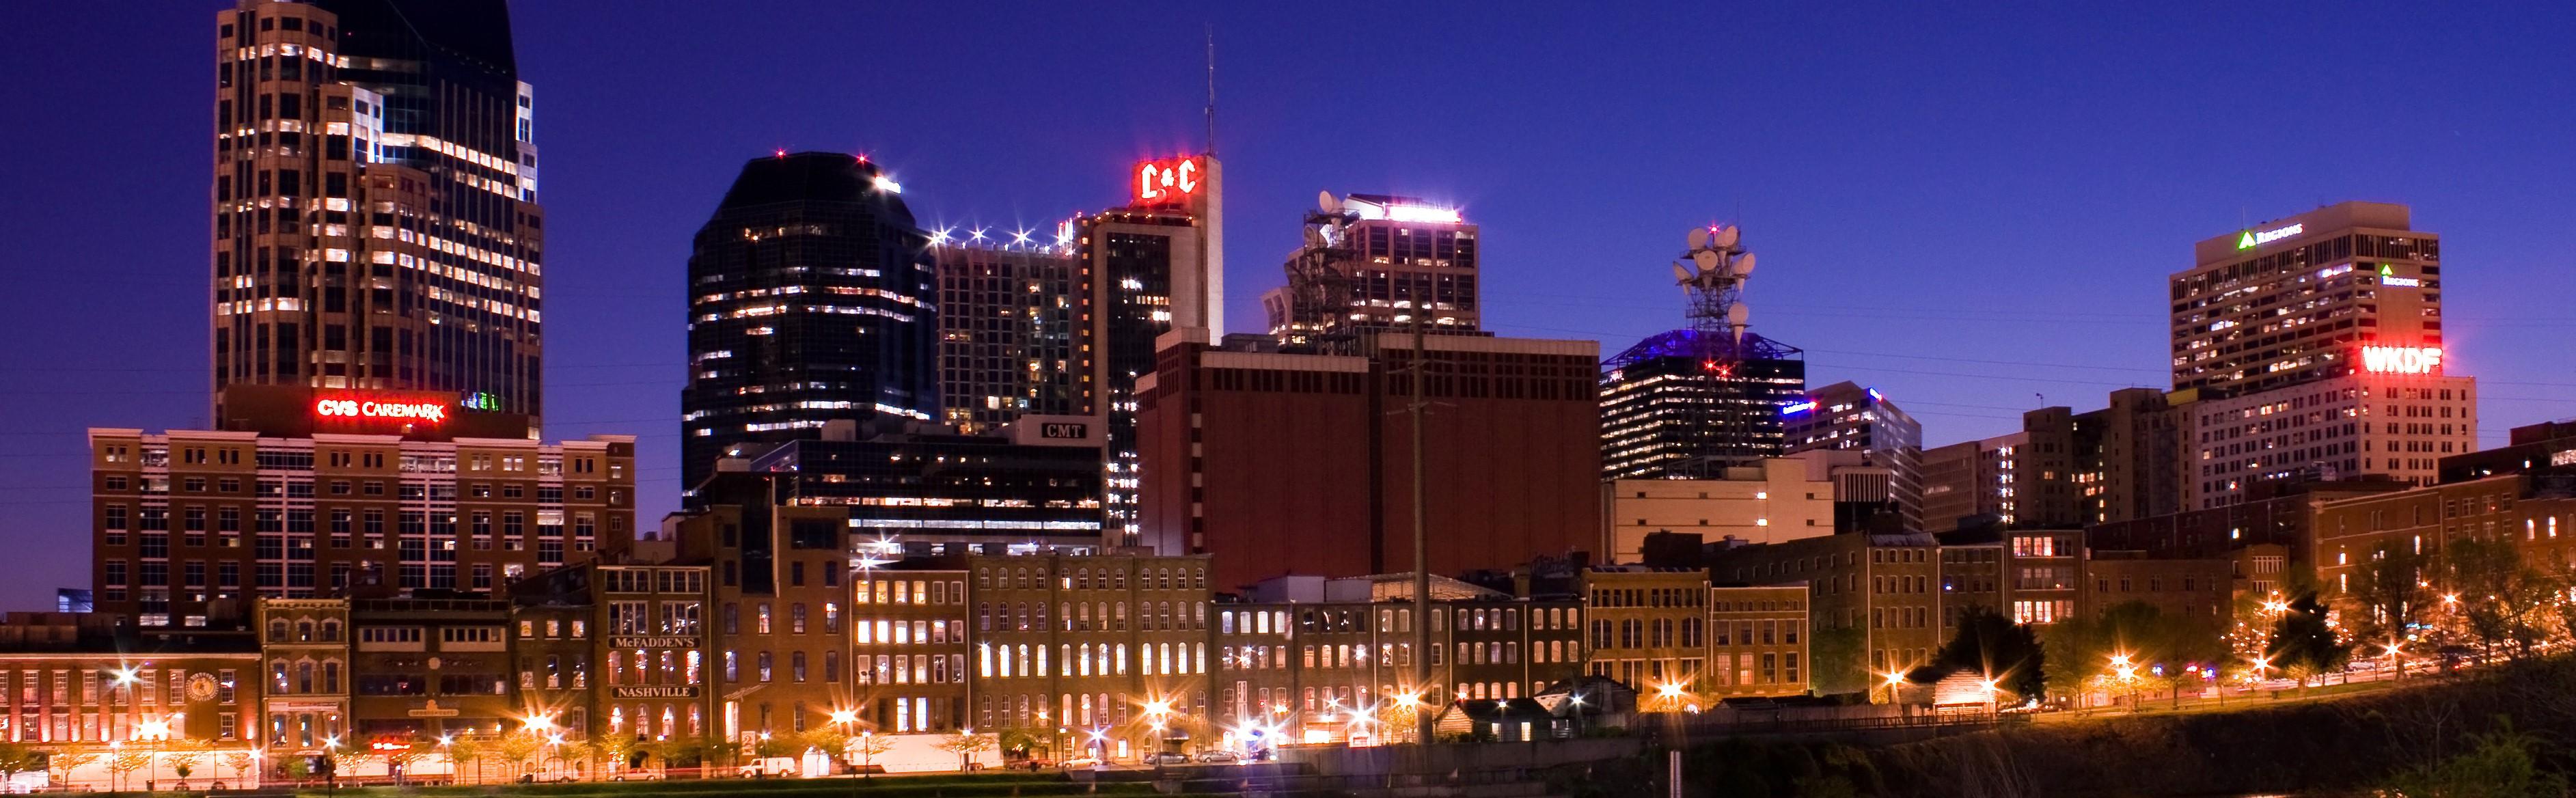 Nashville_skyline_2009.jpg